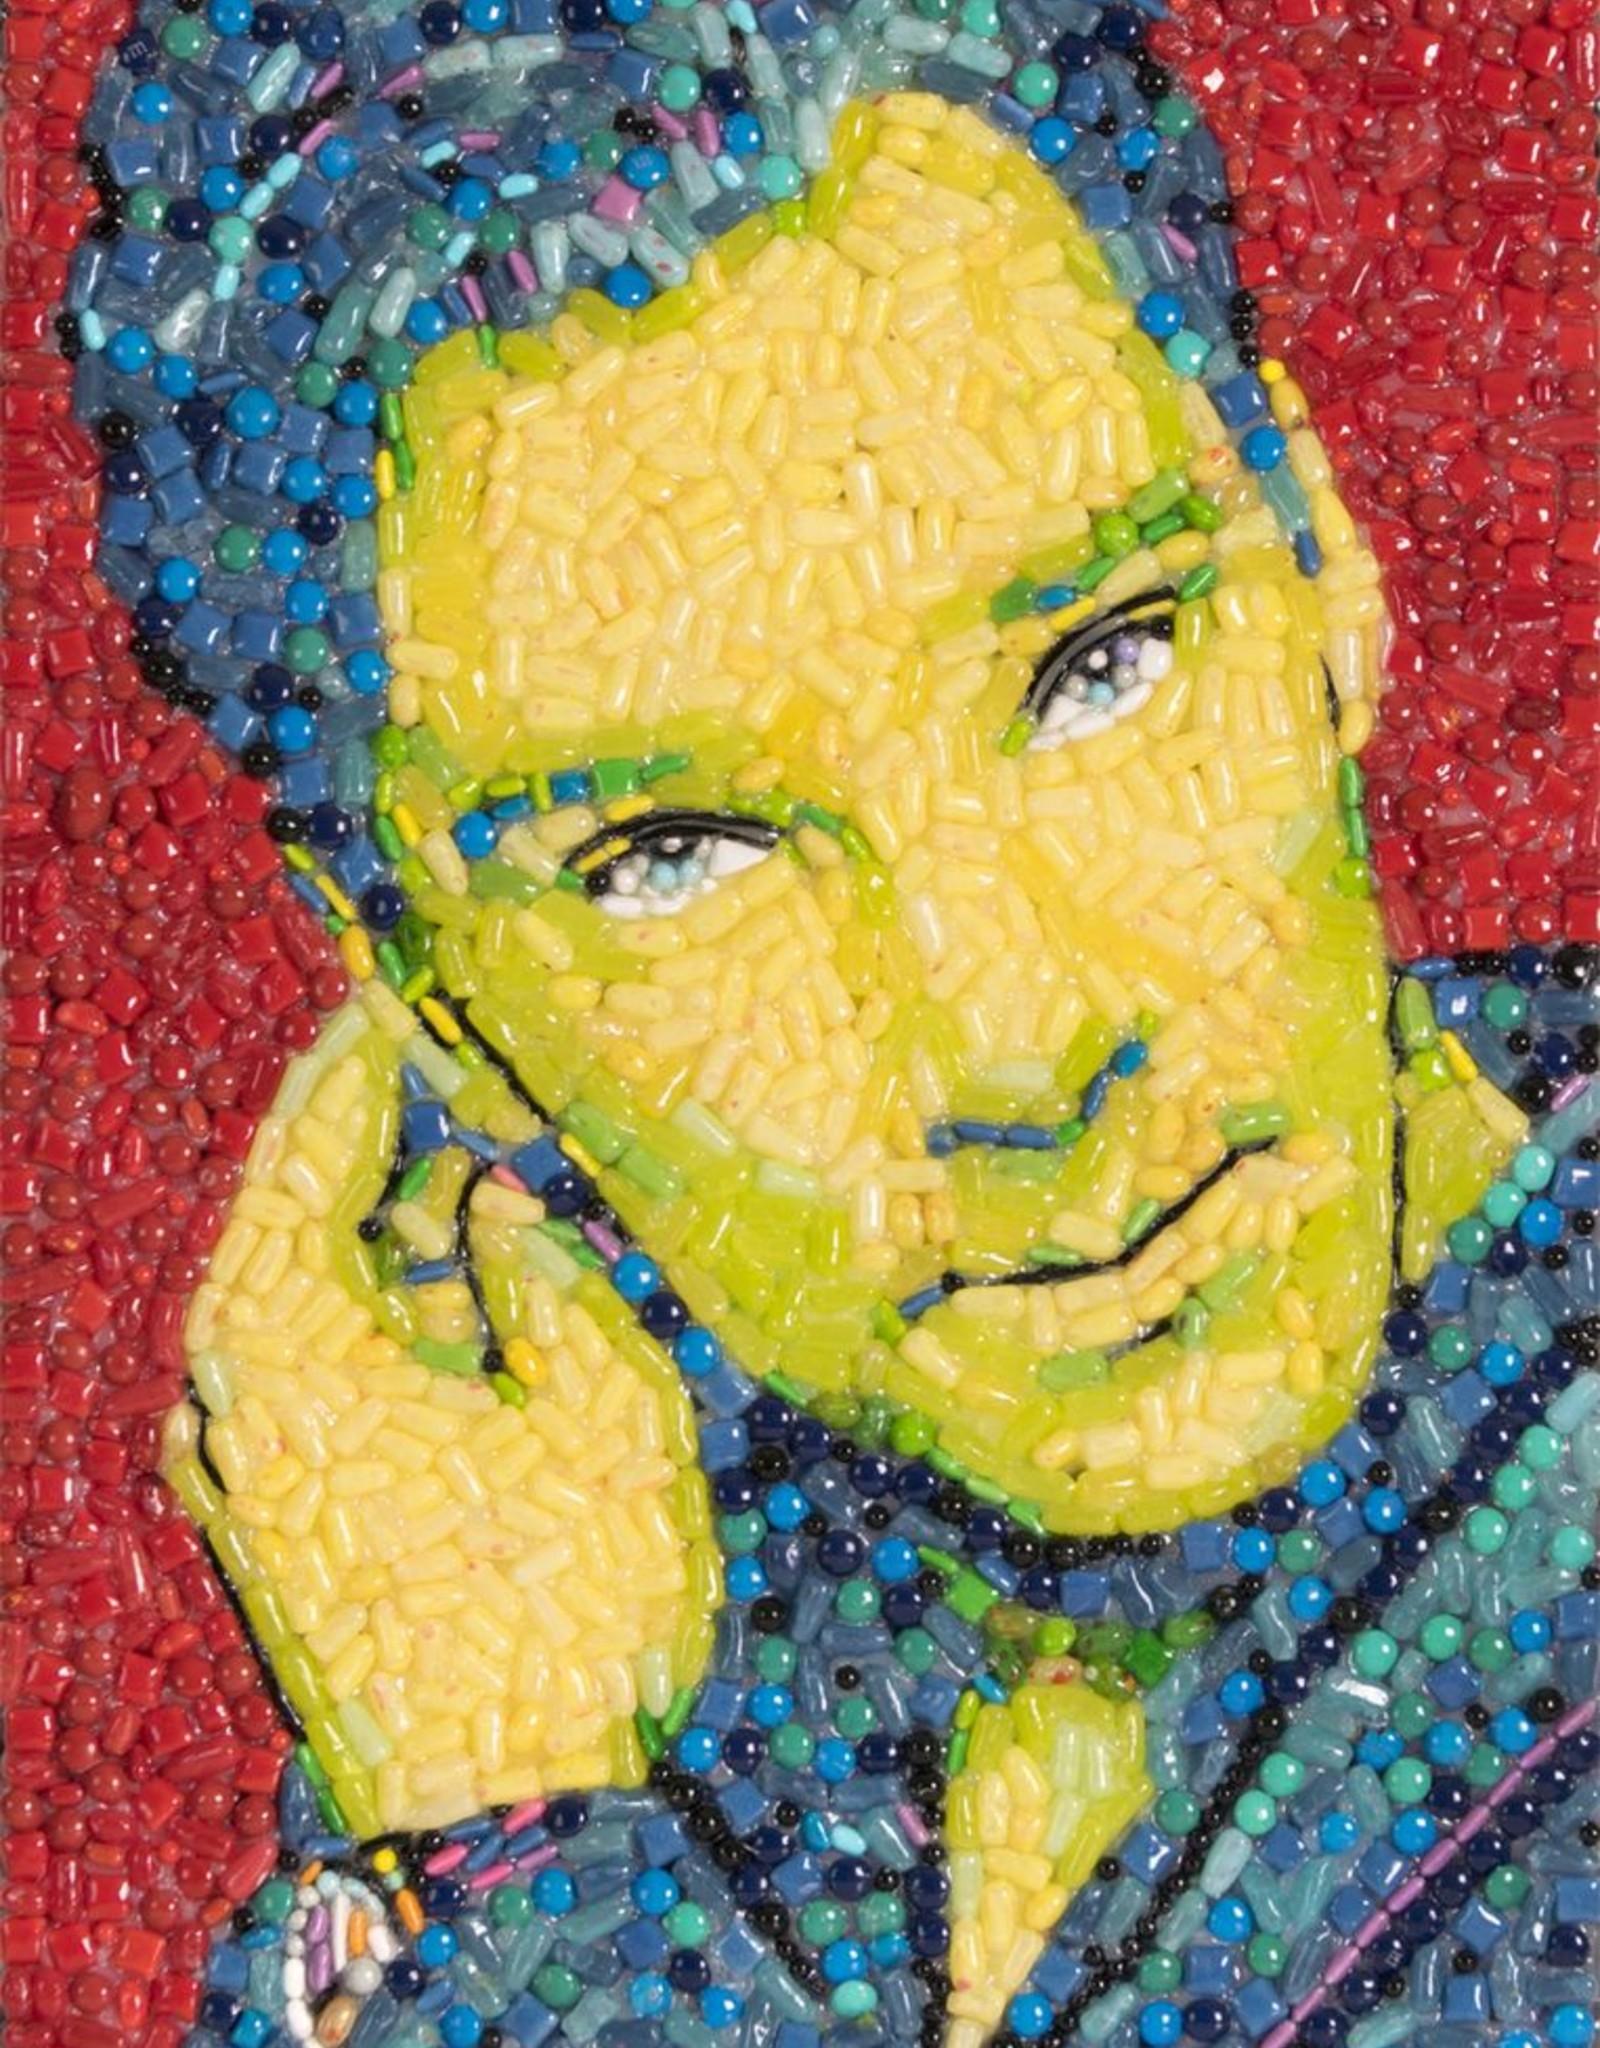 Candylebrity Artwork (18x24) - Benedict Cumberbatch